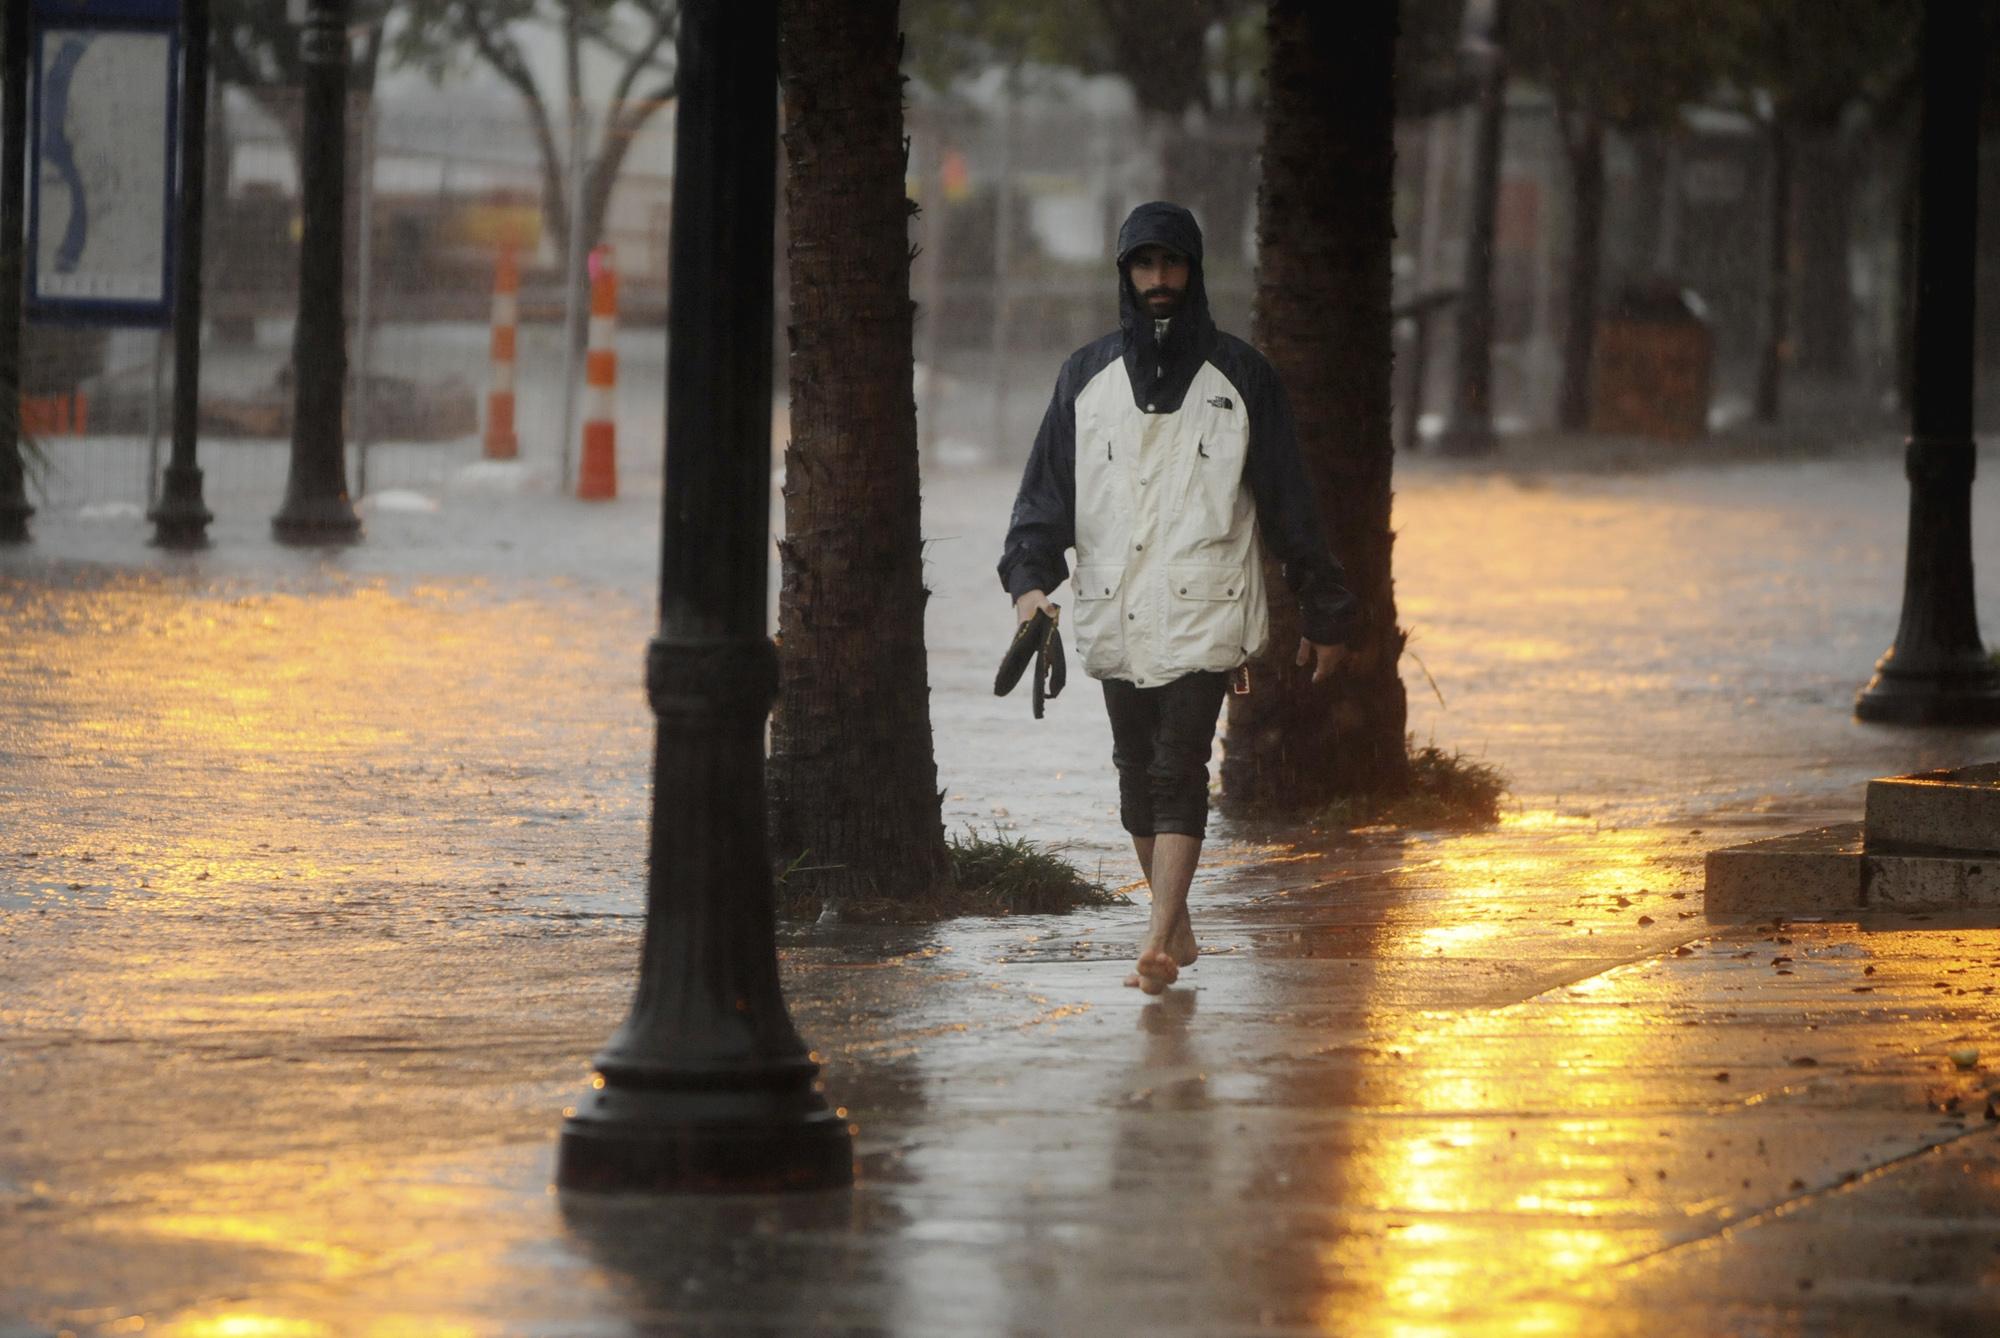 South Carolina flood: Door-to-door searches, swamped roads